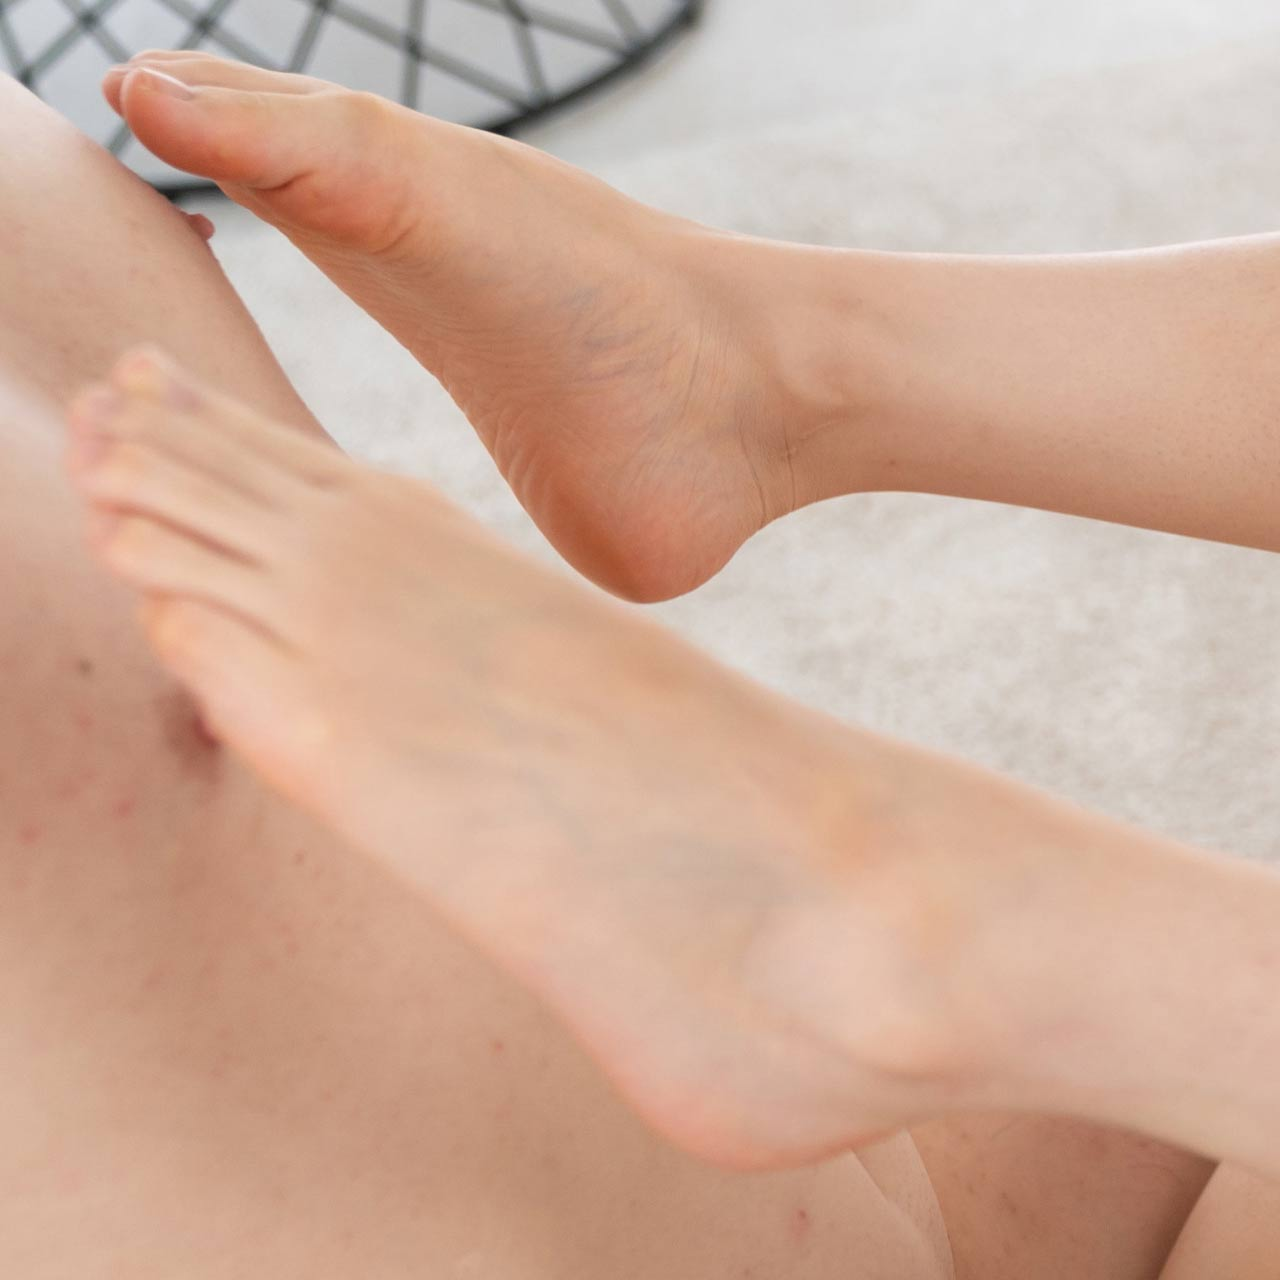 Aika Suzumiya, Schoolgirl Leg Fetish Sex for LegsJapan. Uncensored Foot Fetish from Japan.